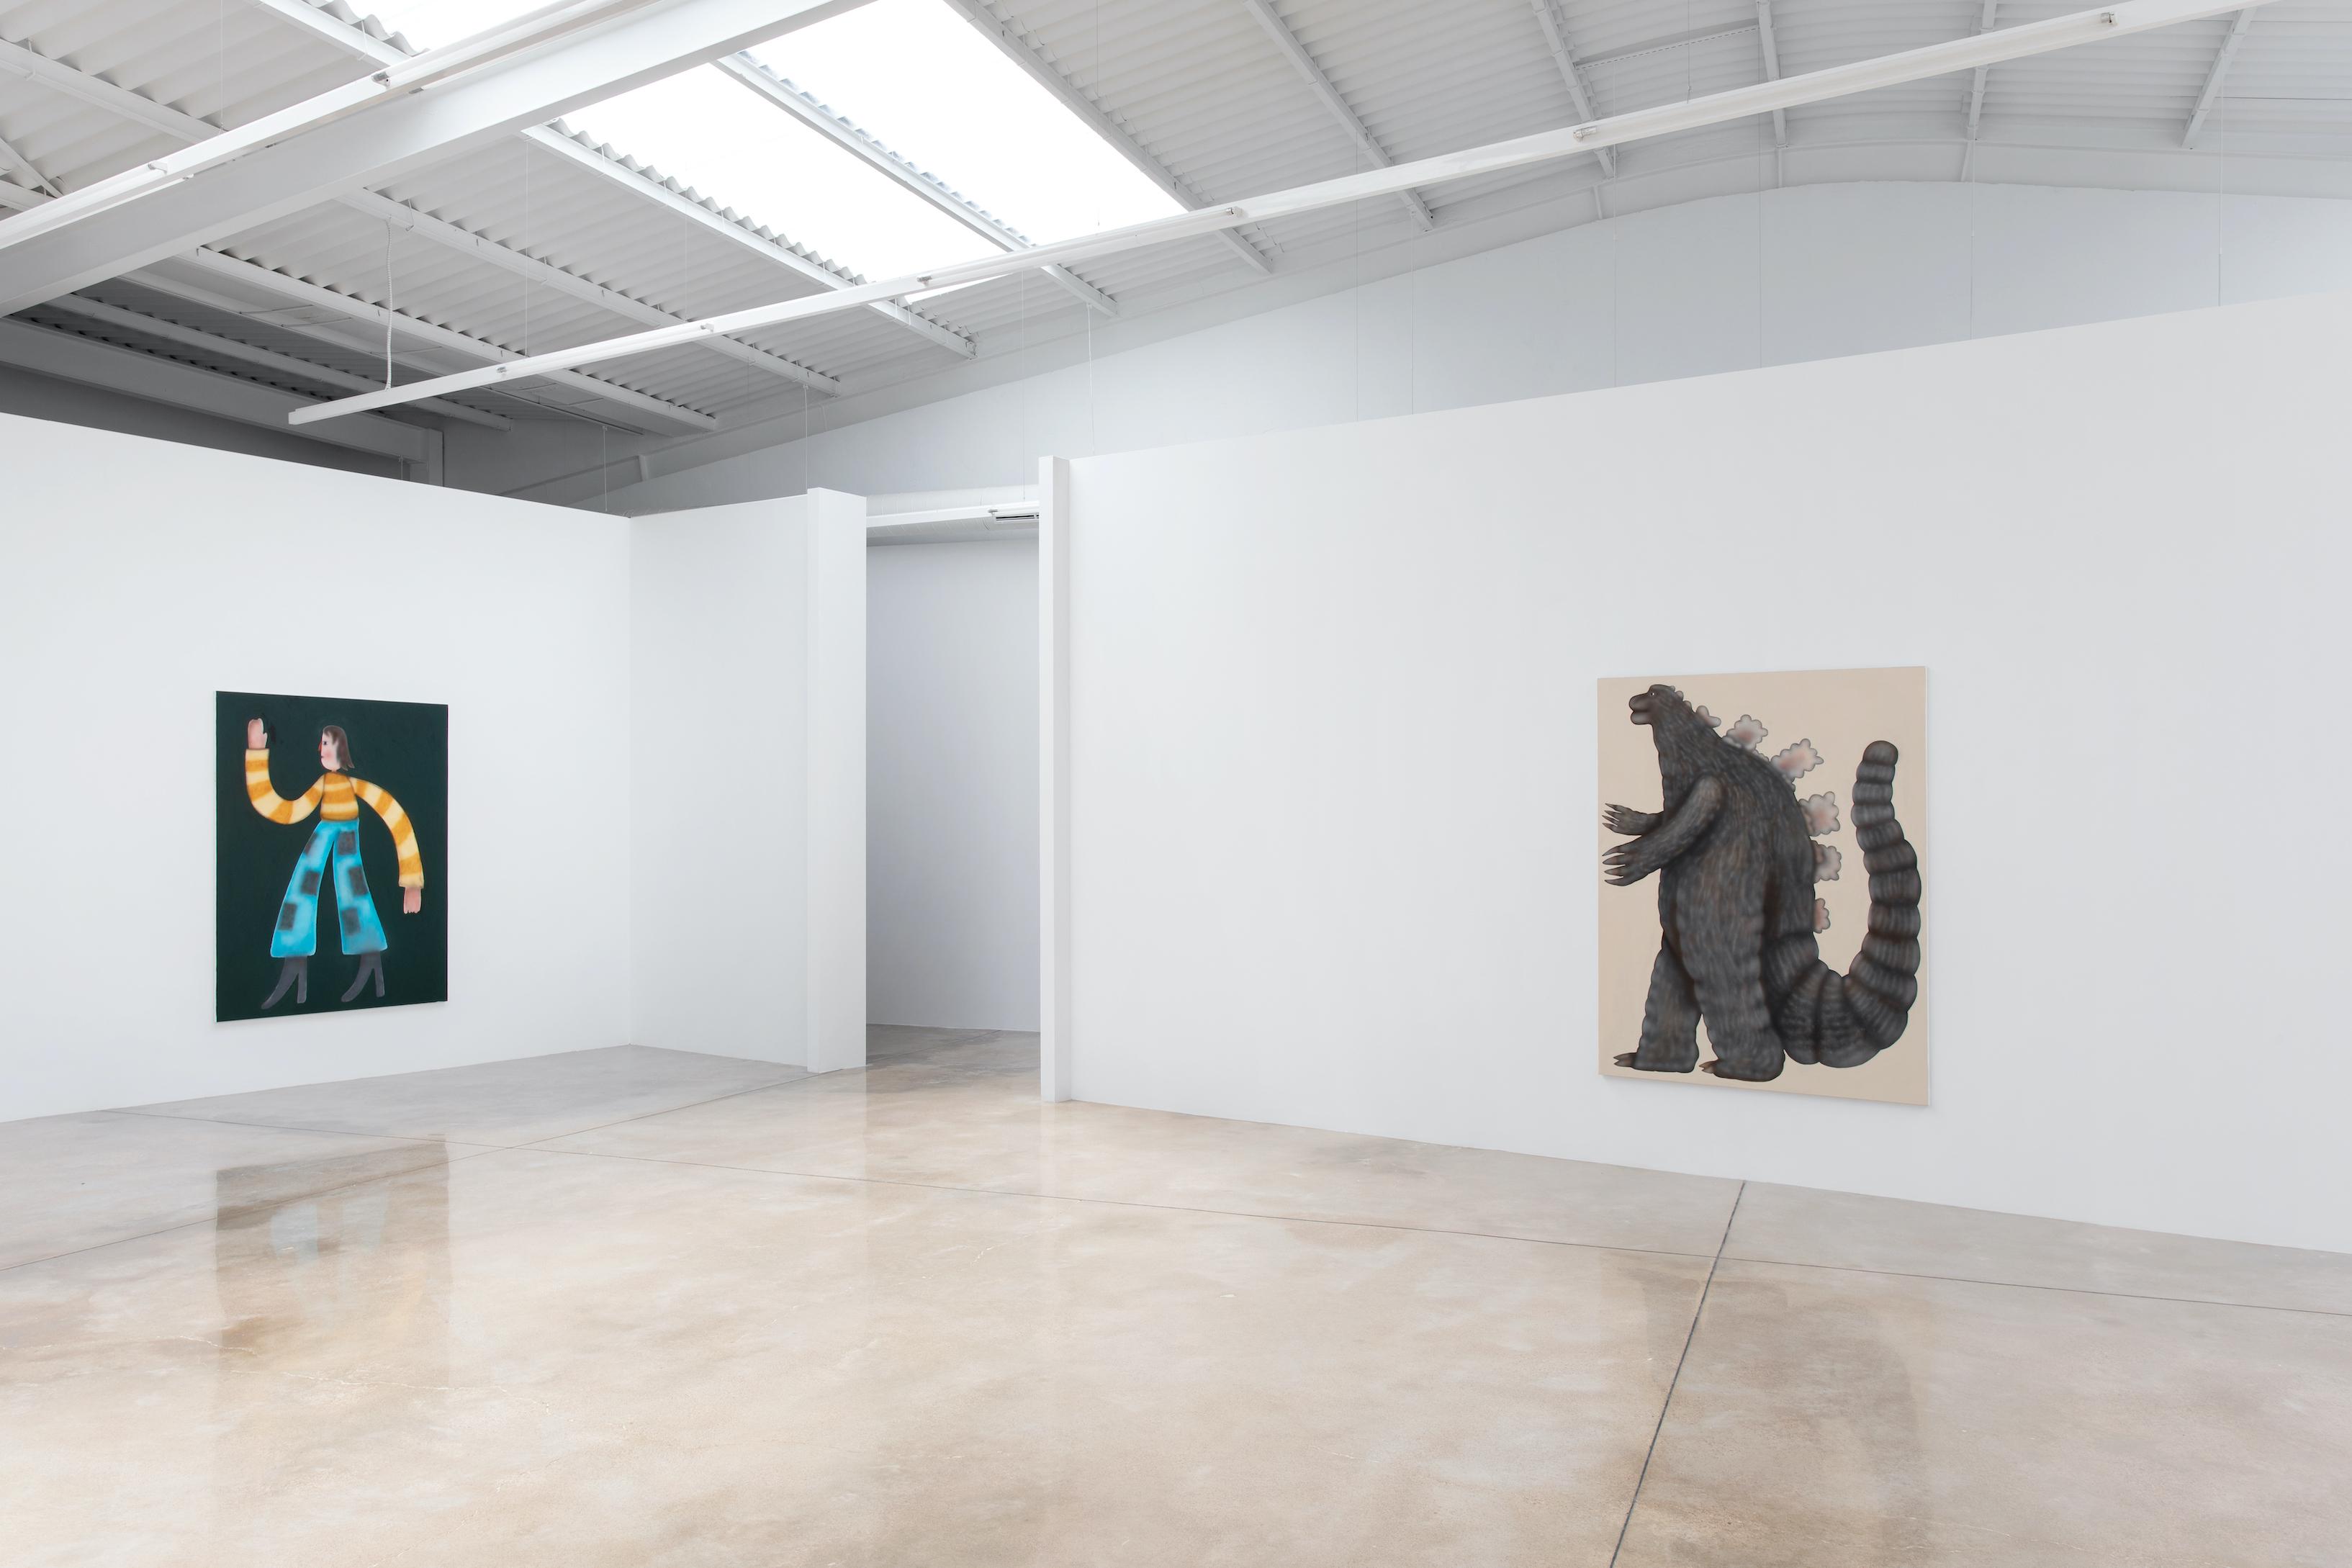 Installation View, Buff Titan, L21, Palma, 2021, Courtesy of the Gallery and the artist, Photography - Natasha Lebedeva